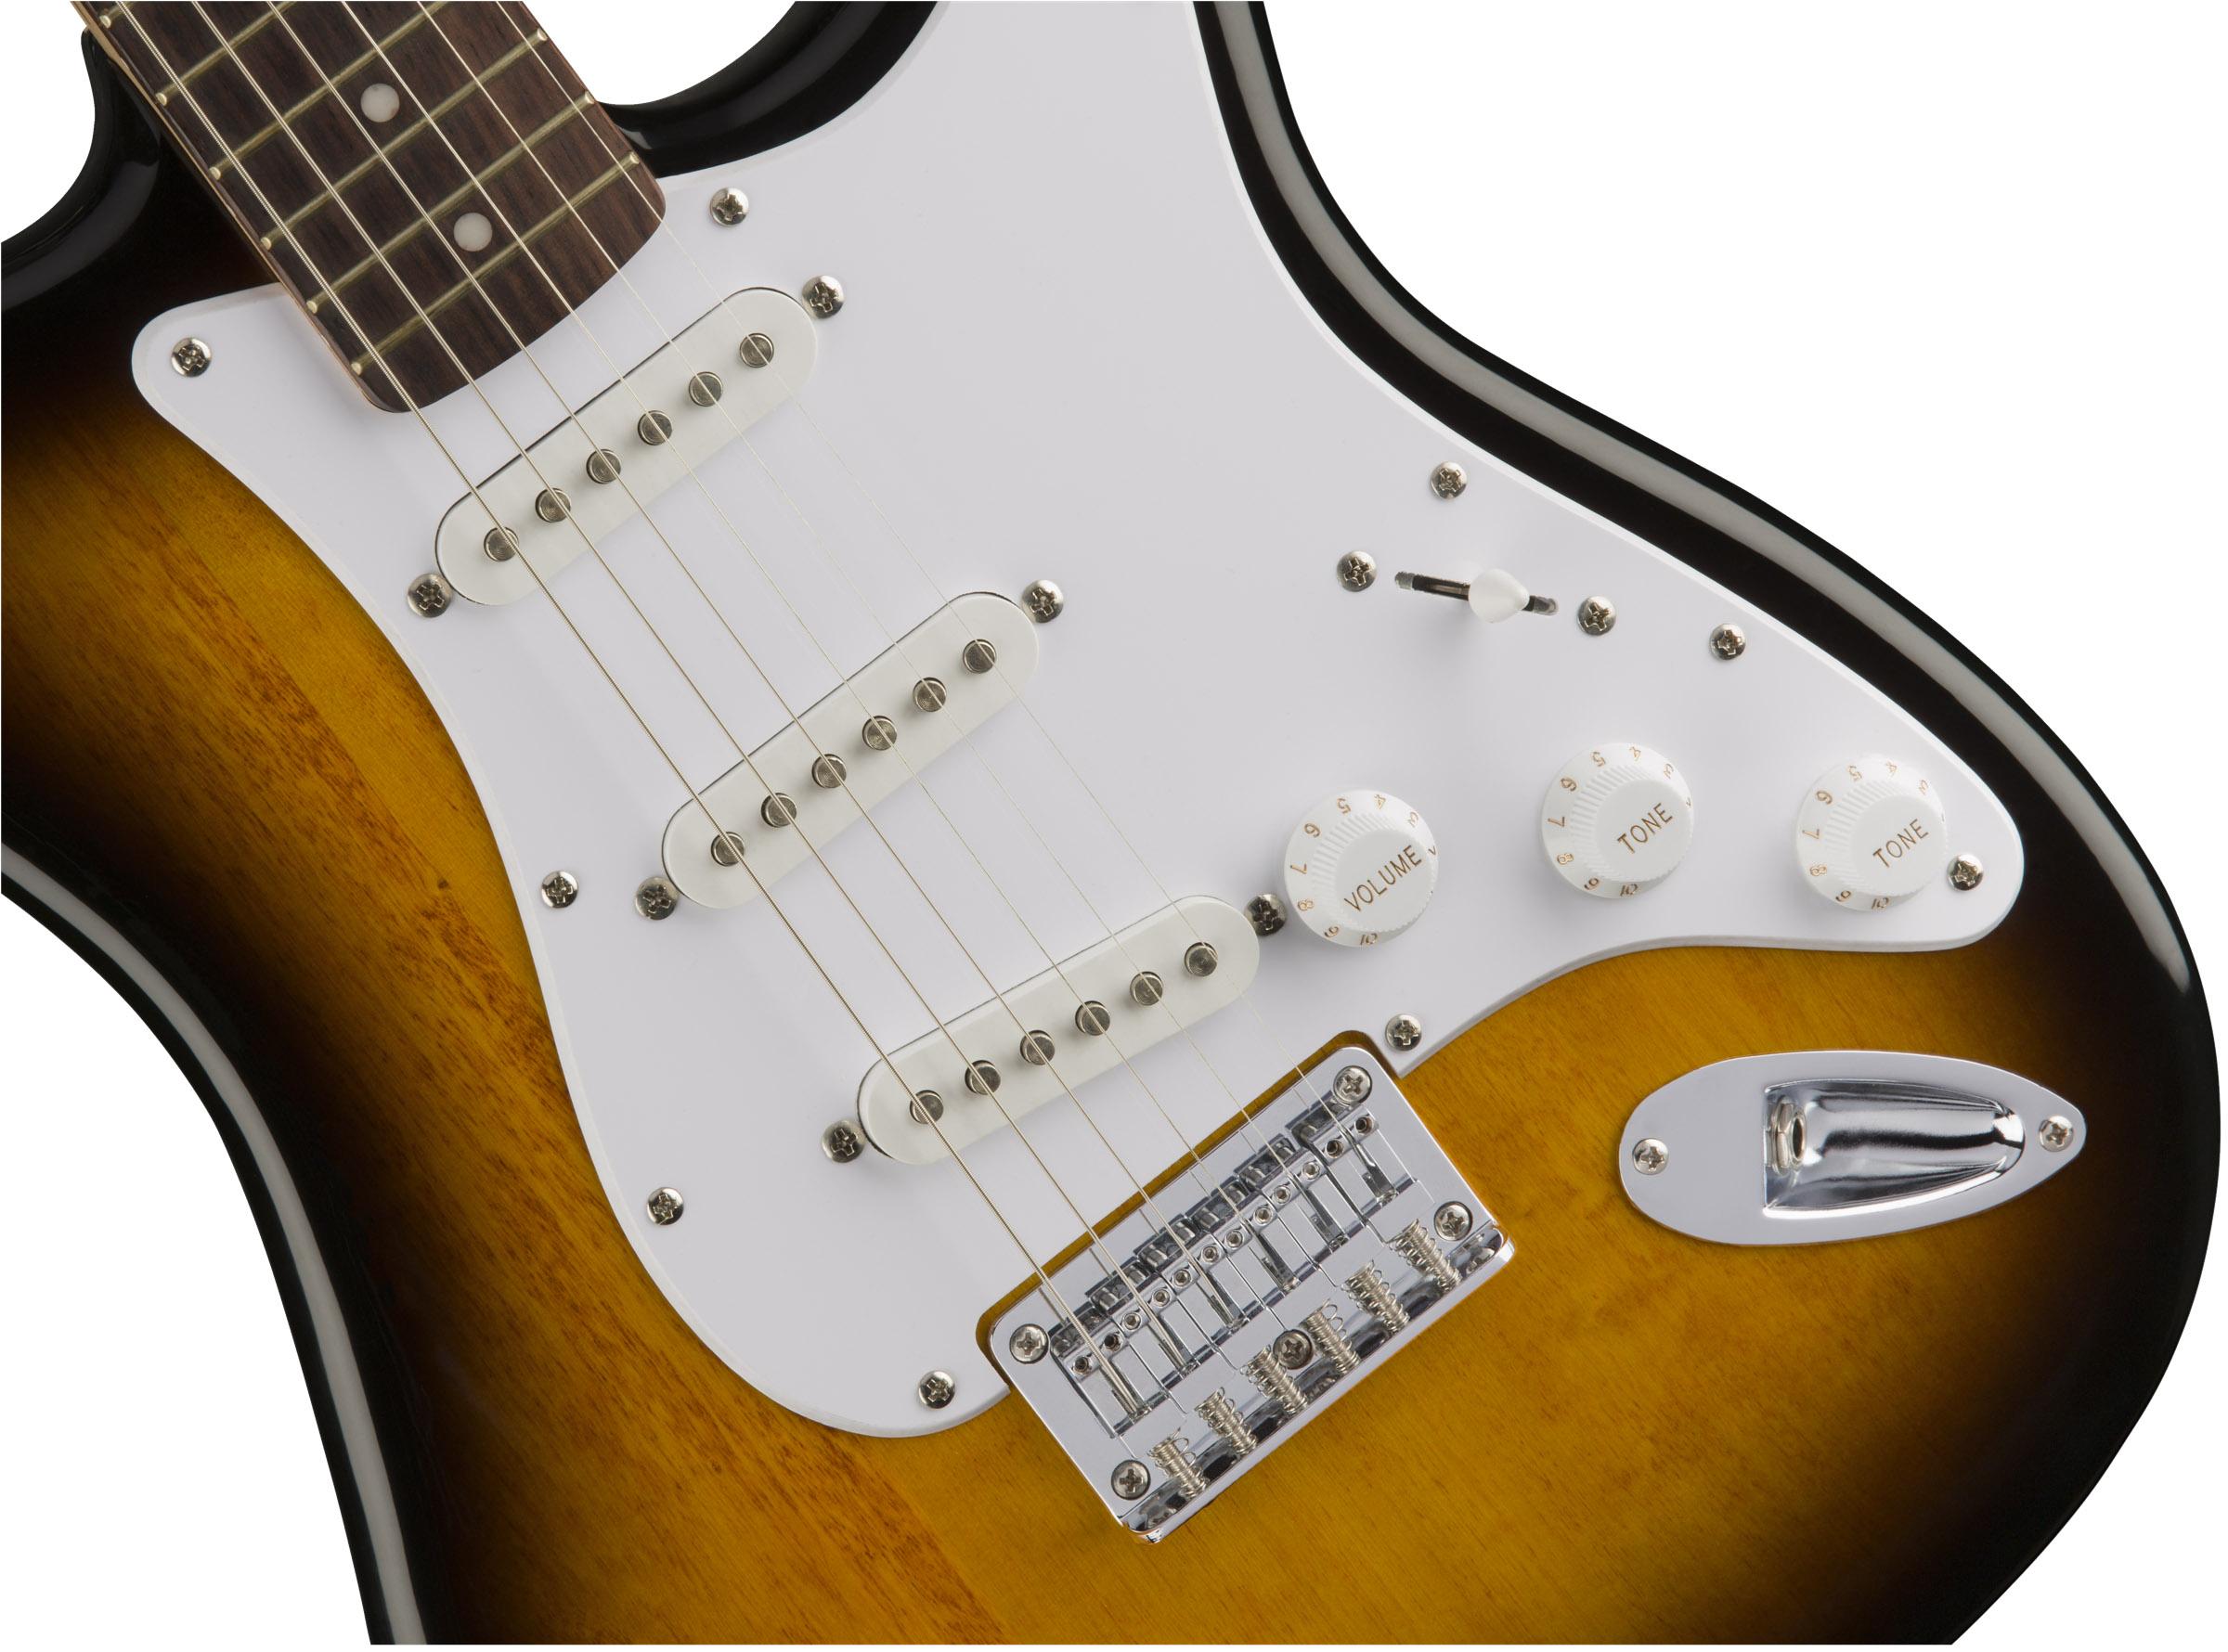 thumbnail 4 - Fender Squier Bullet Stratocaster HT - Sunburst w/ Frontman 10G Amplifier